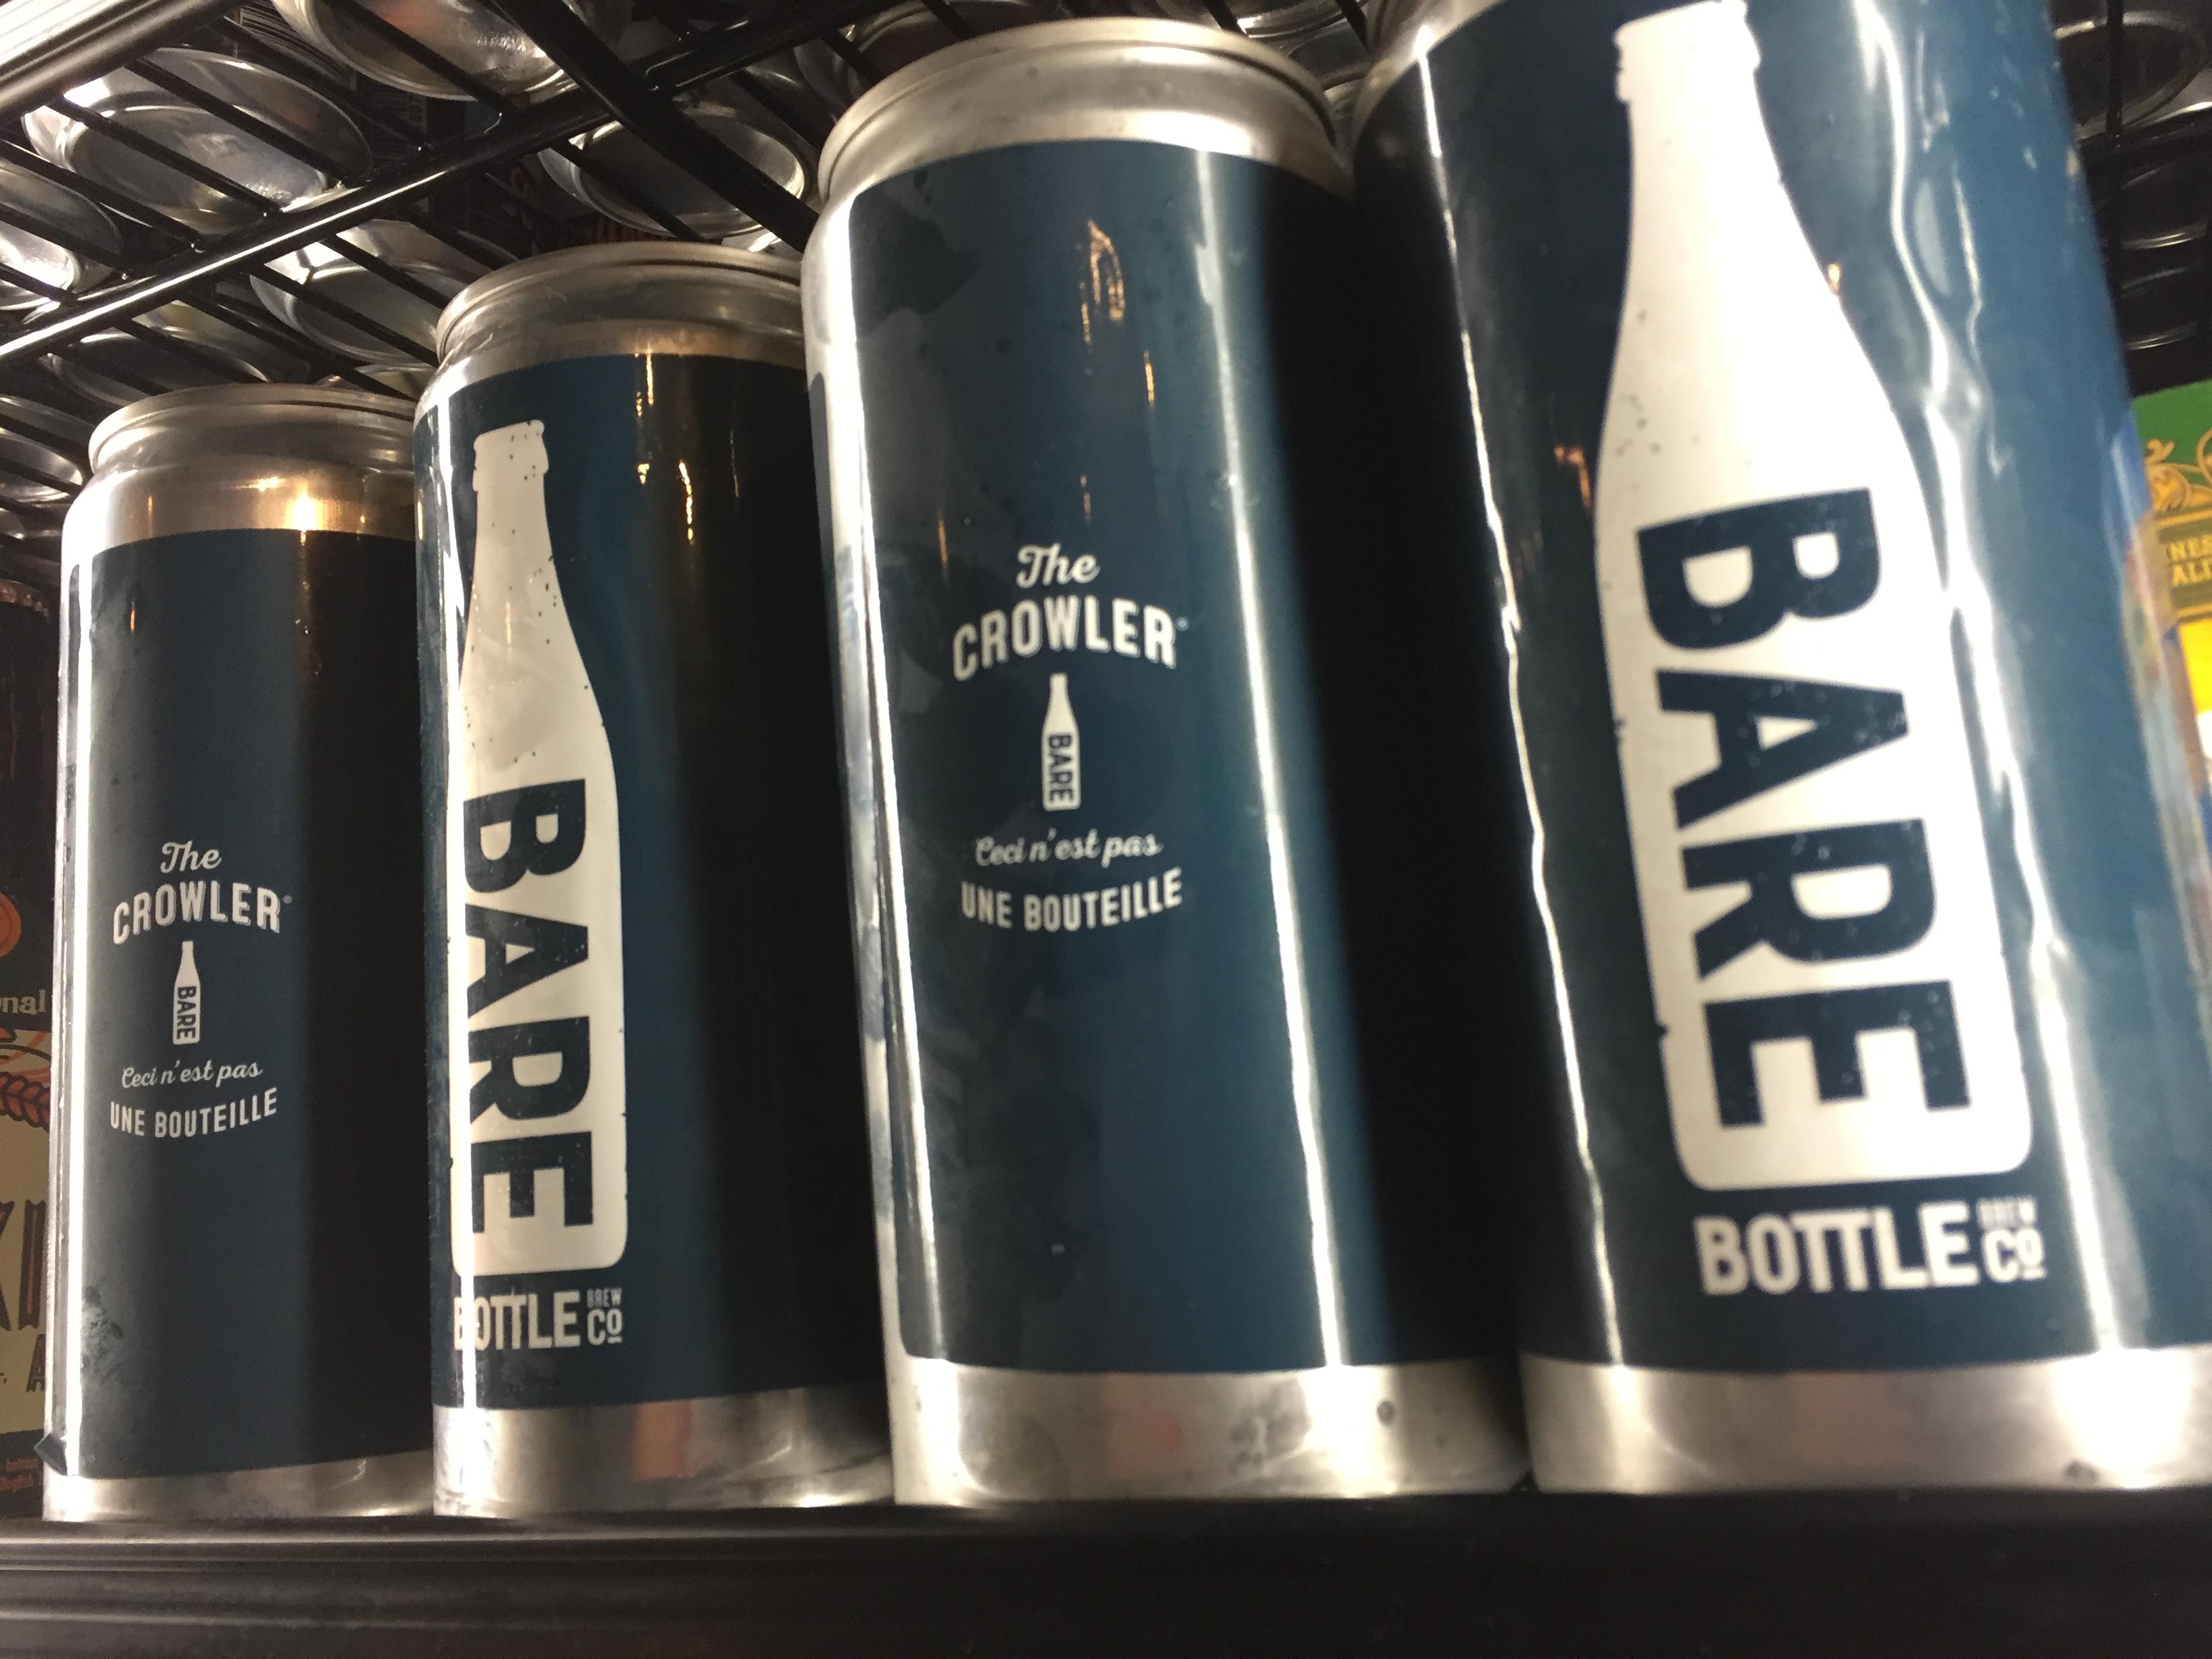 Limited Barebottle Crowlers: On Shelves Friday, September 2nd